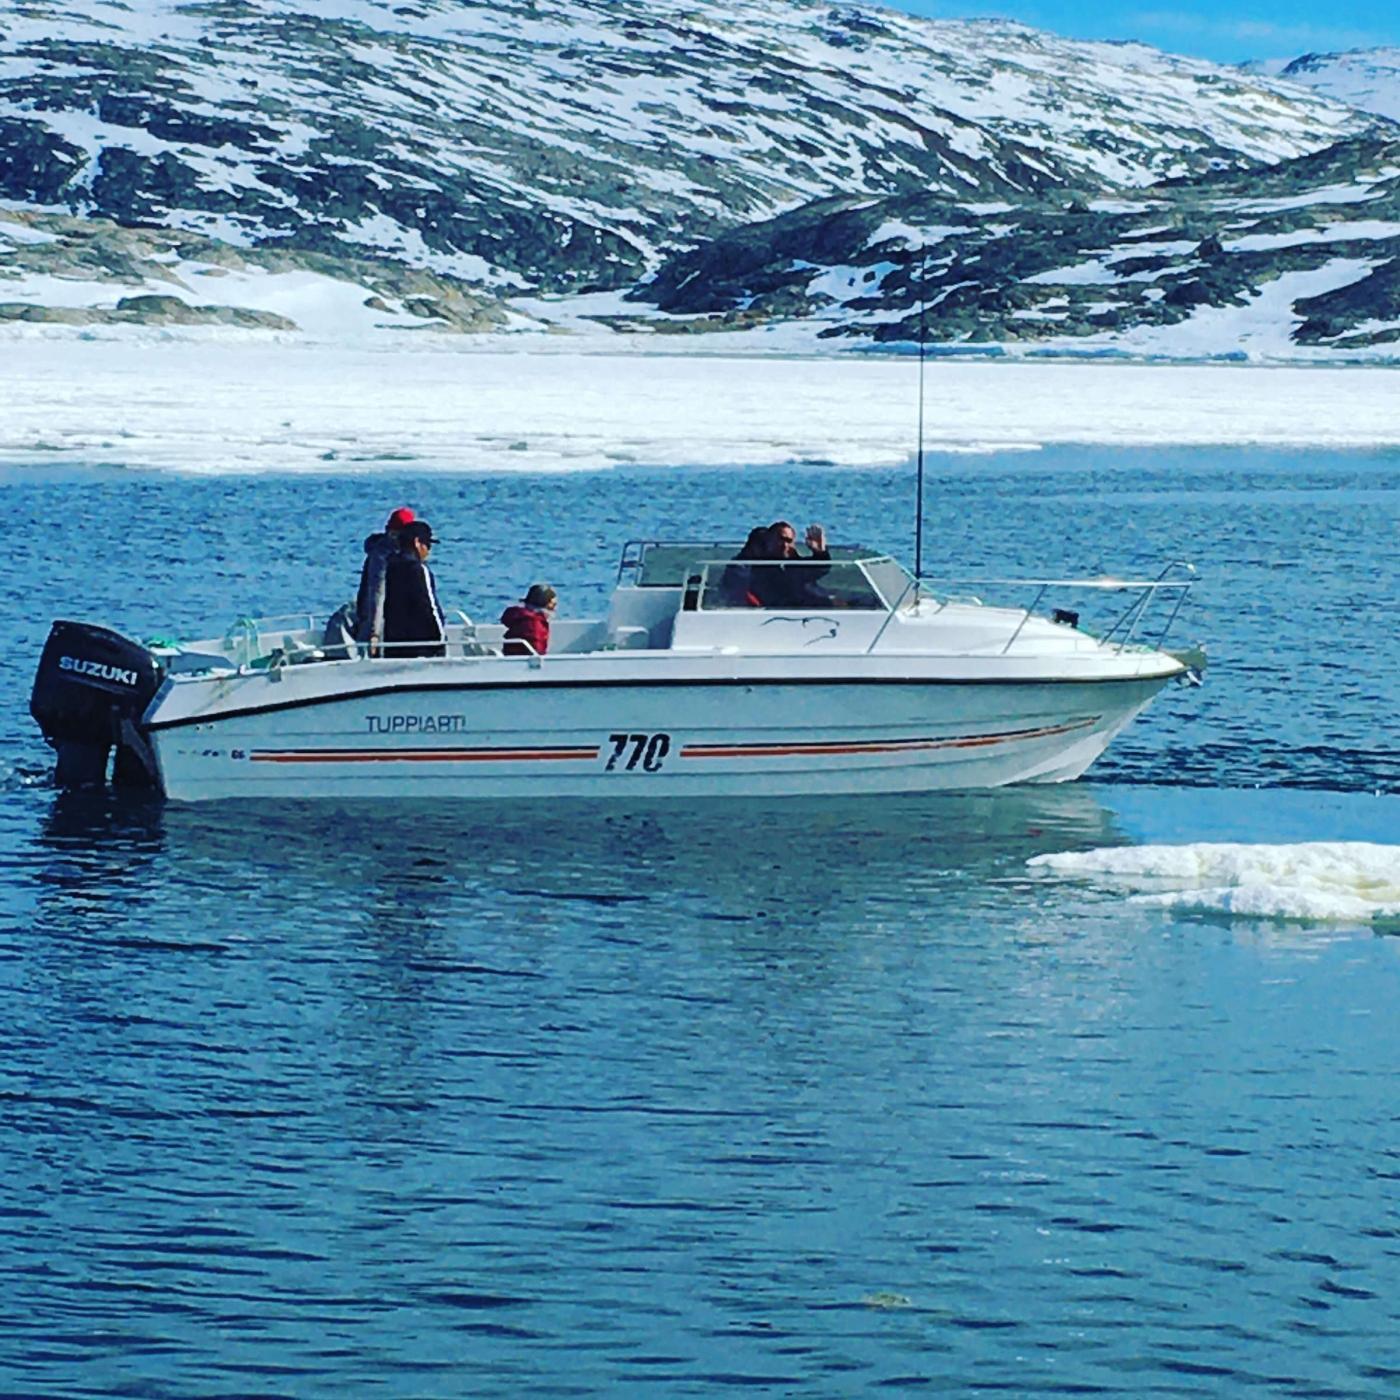 Our tour boat Tuppiati (greenlandic for Tobias). Photo by Line Kristiansen